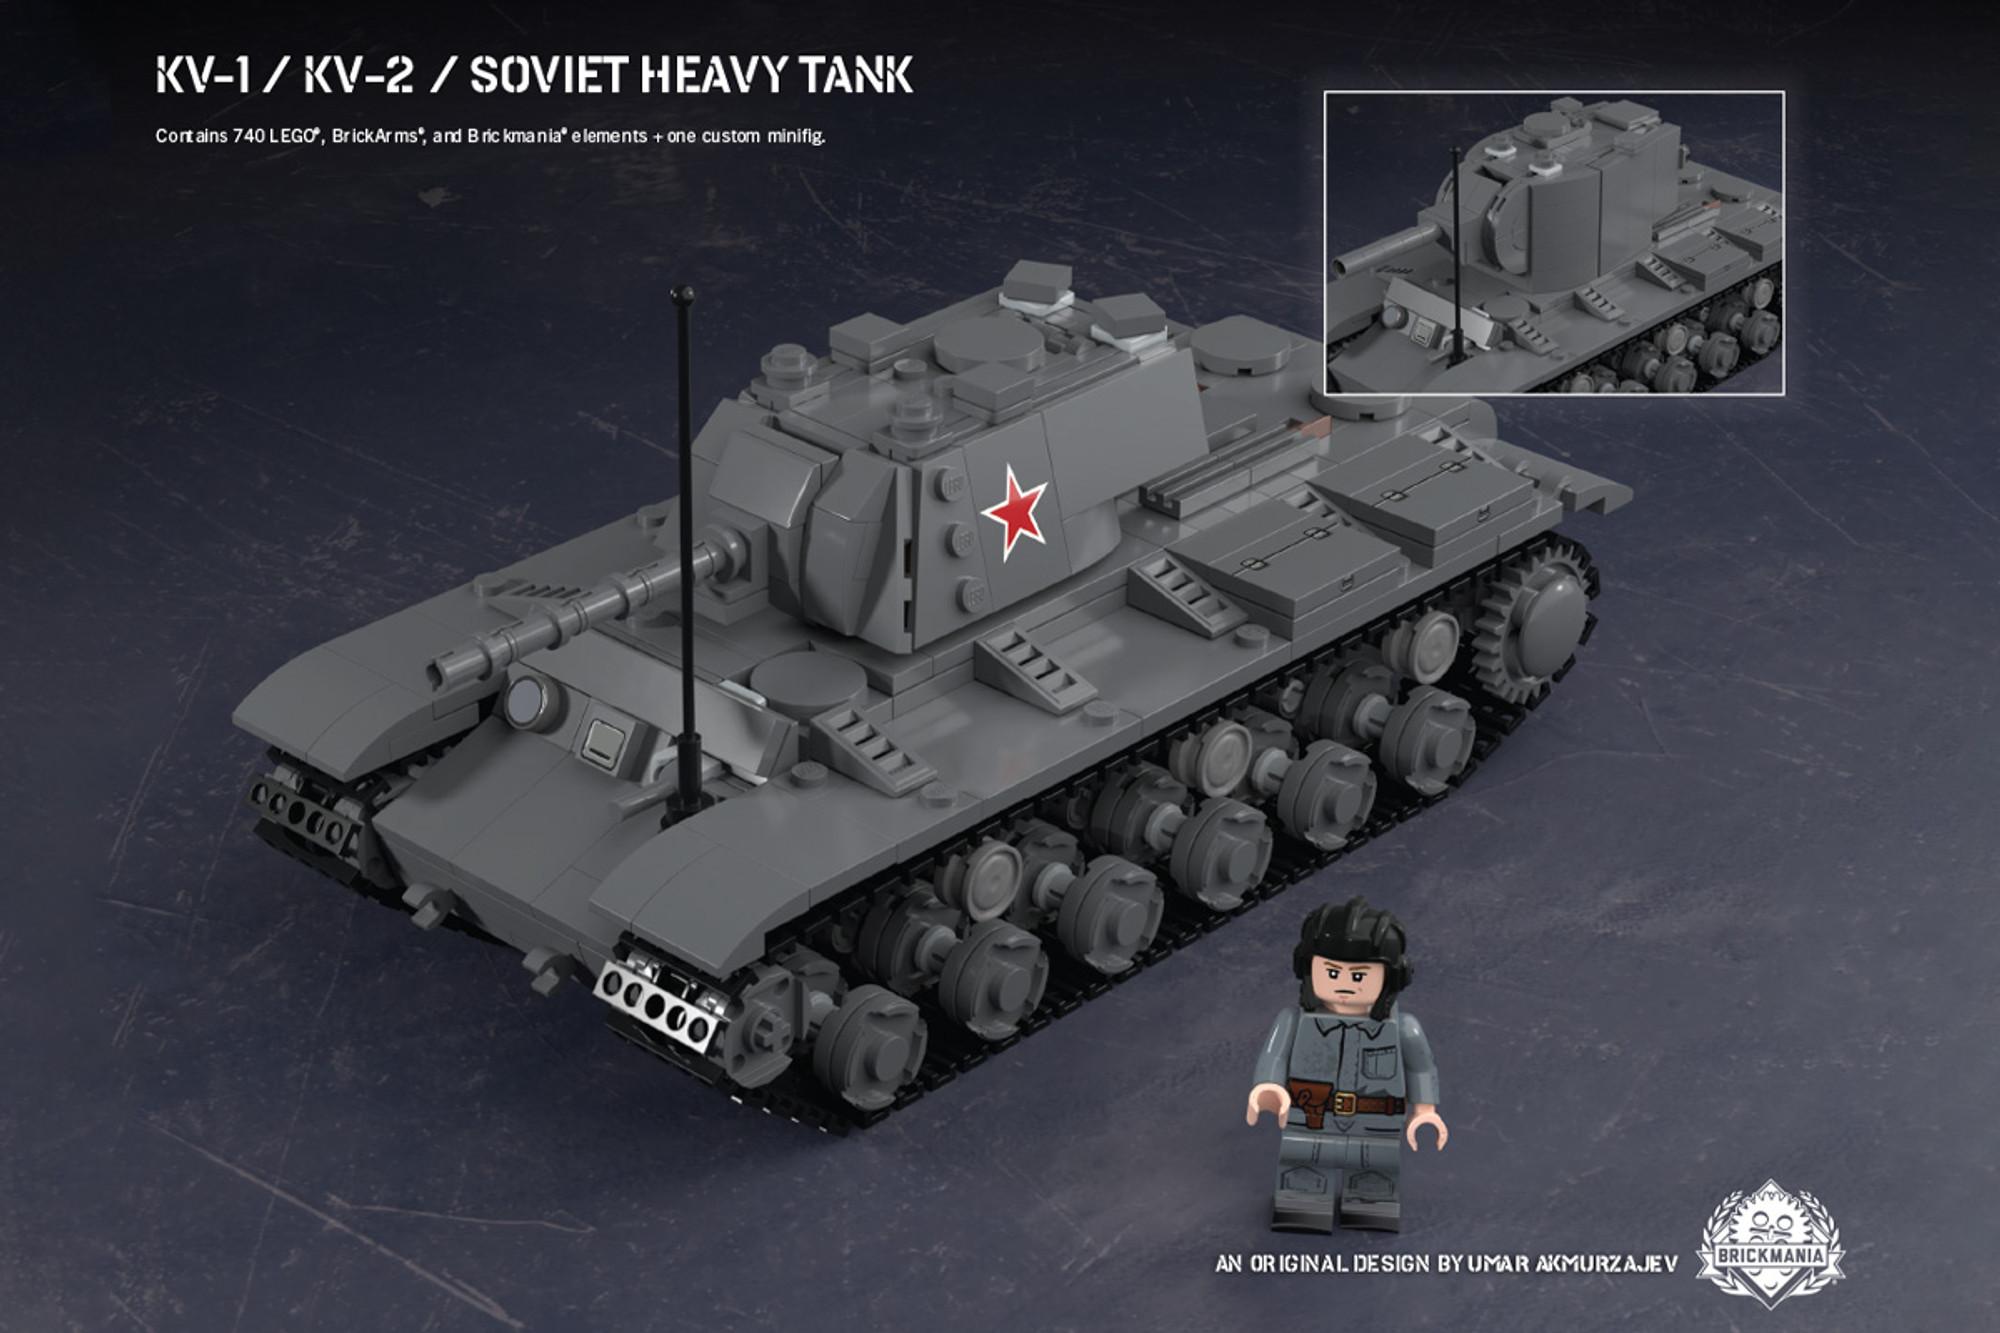 KV-1/KV-2 - Soviet Heavy Tank